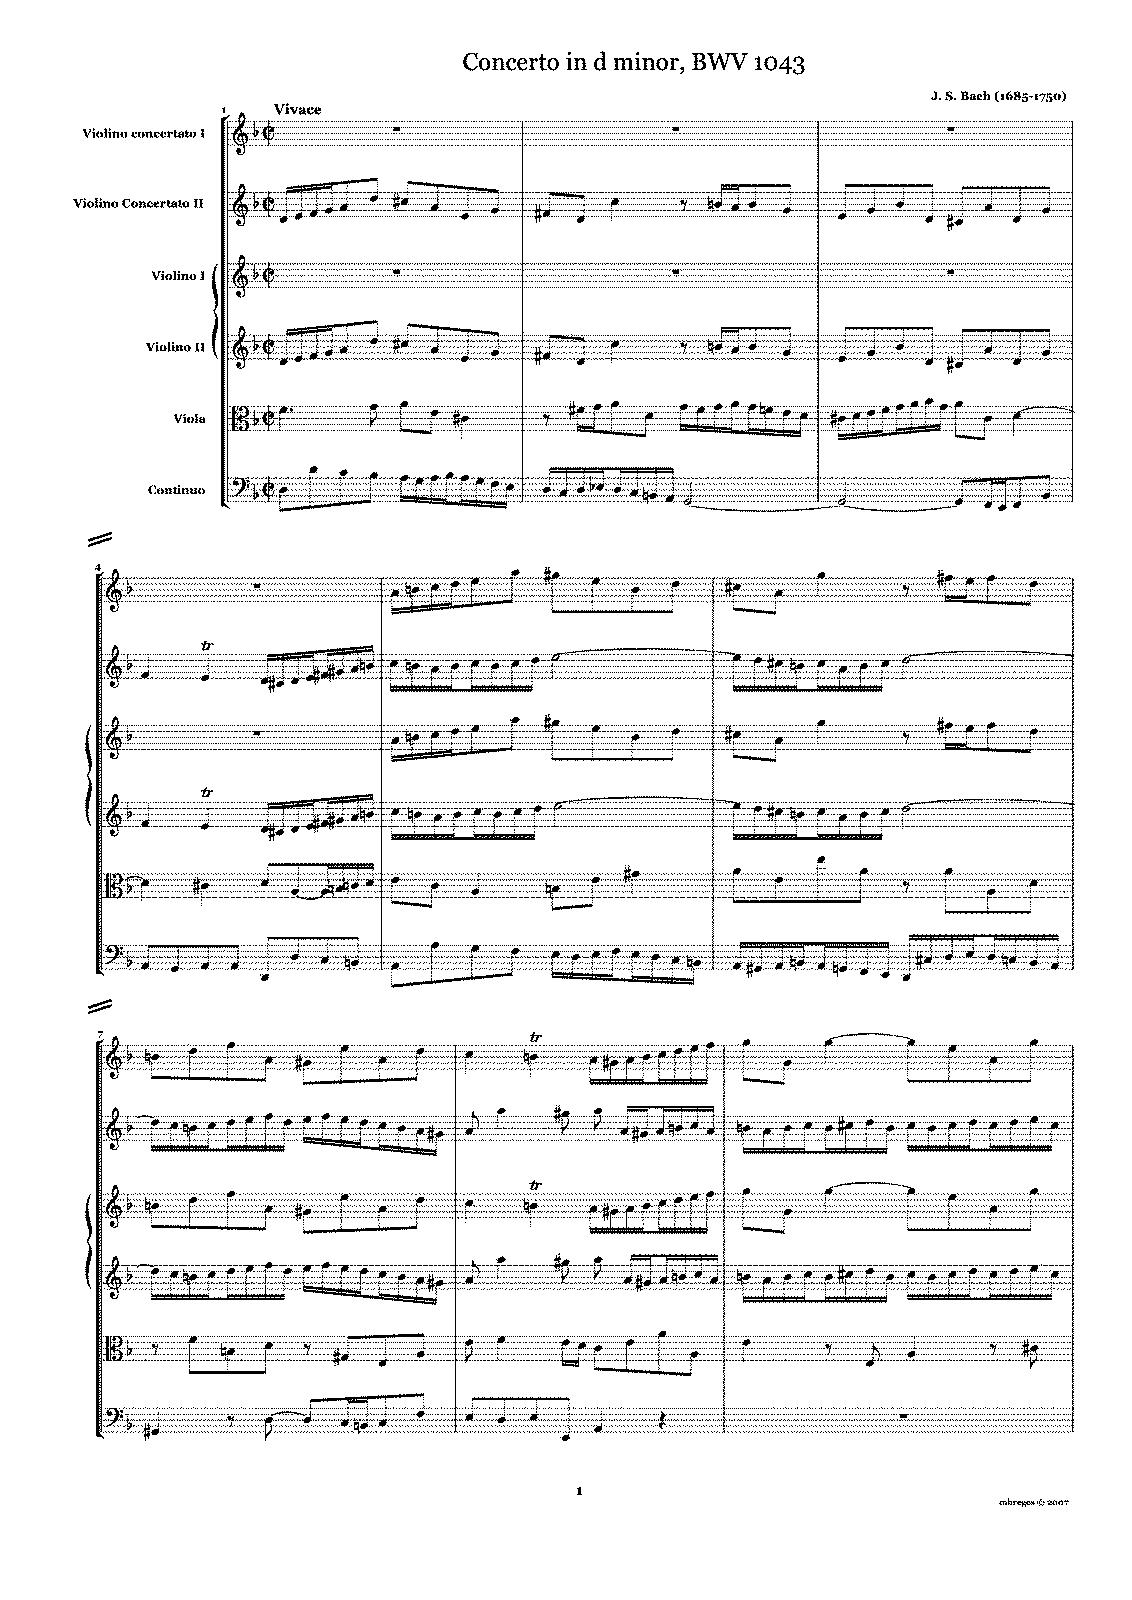 fiolinkonserter bmw 1041 1042 1052